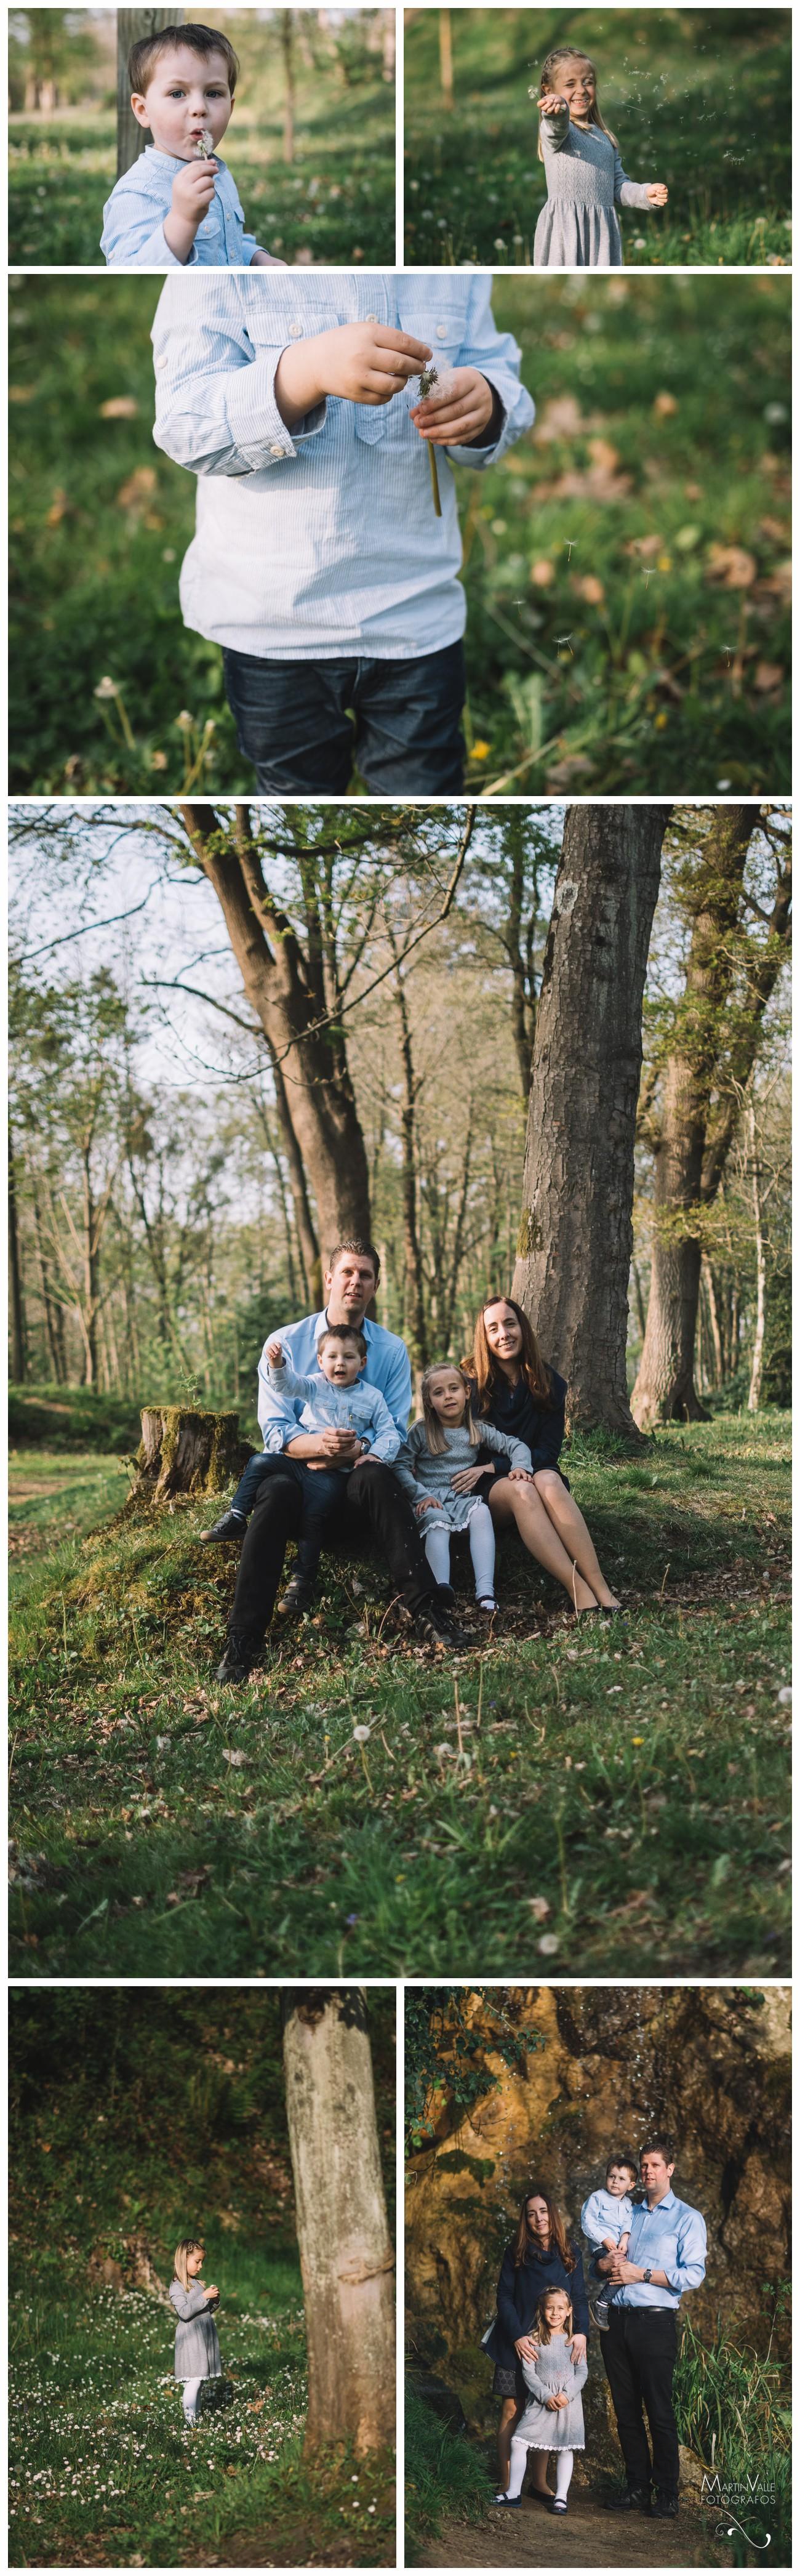 Reportaje en familia en Asturias